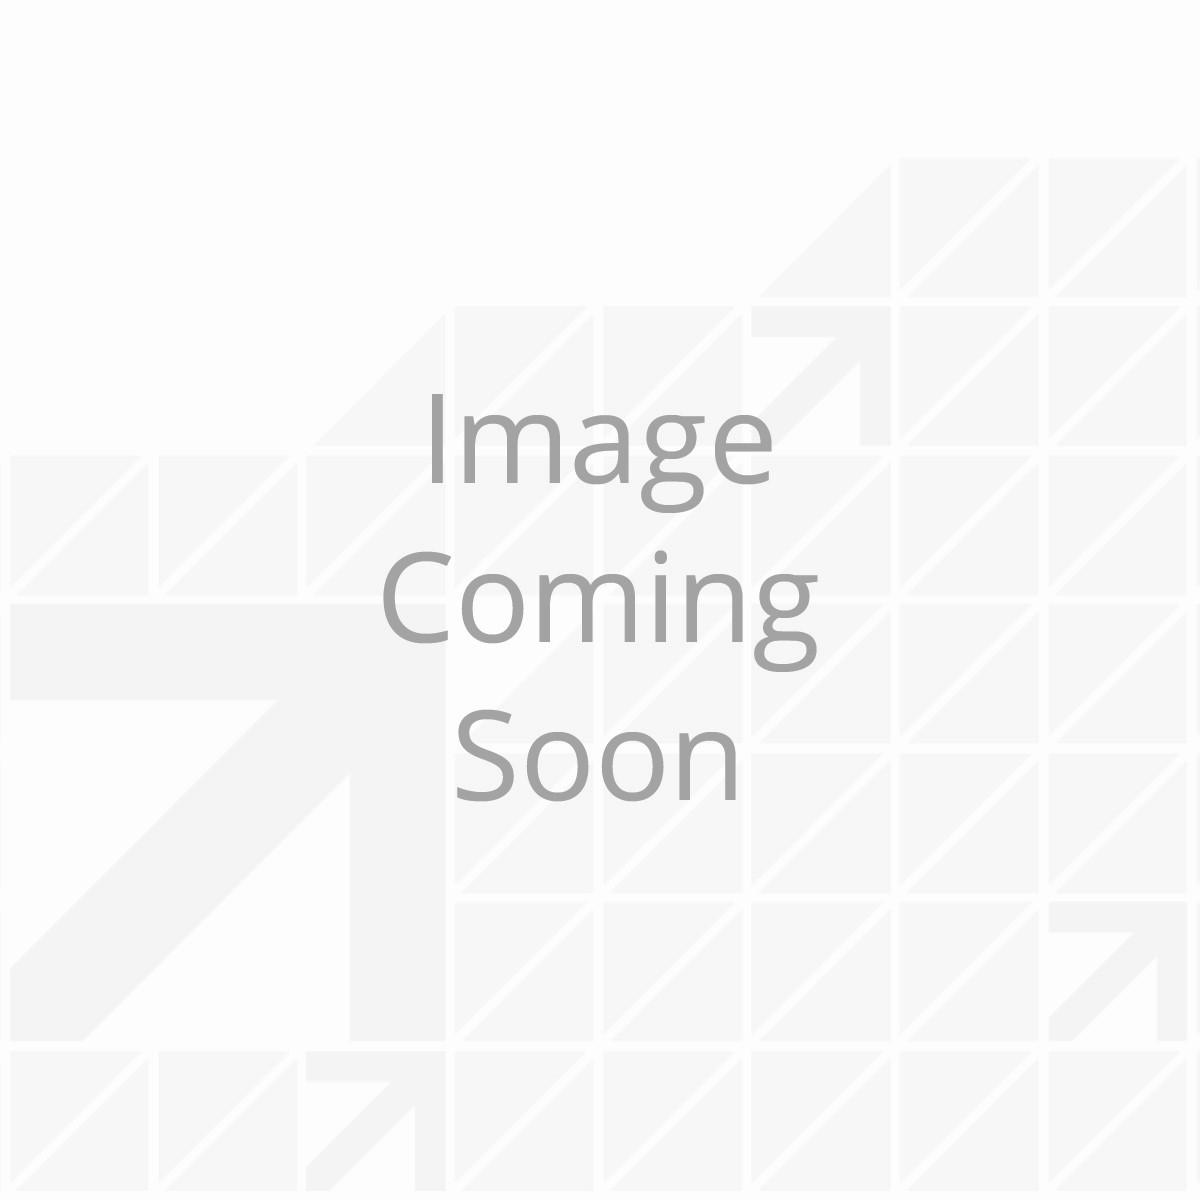 "Spyder 5th Wheel Rail Gooseneck Hitch with 2-5/16"" Ball, 30K"